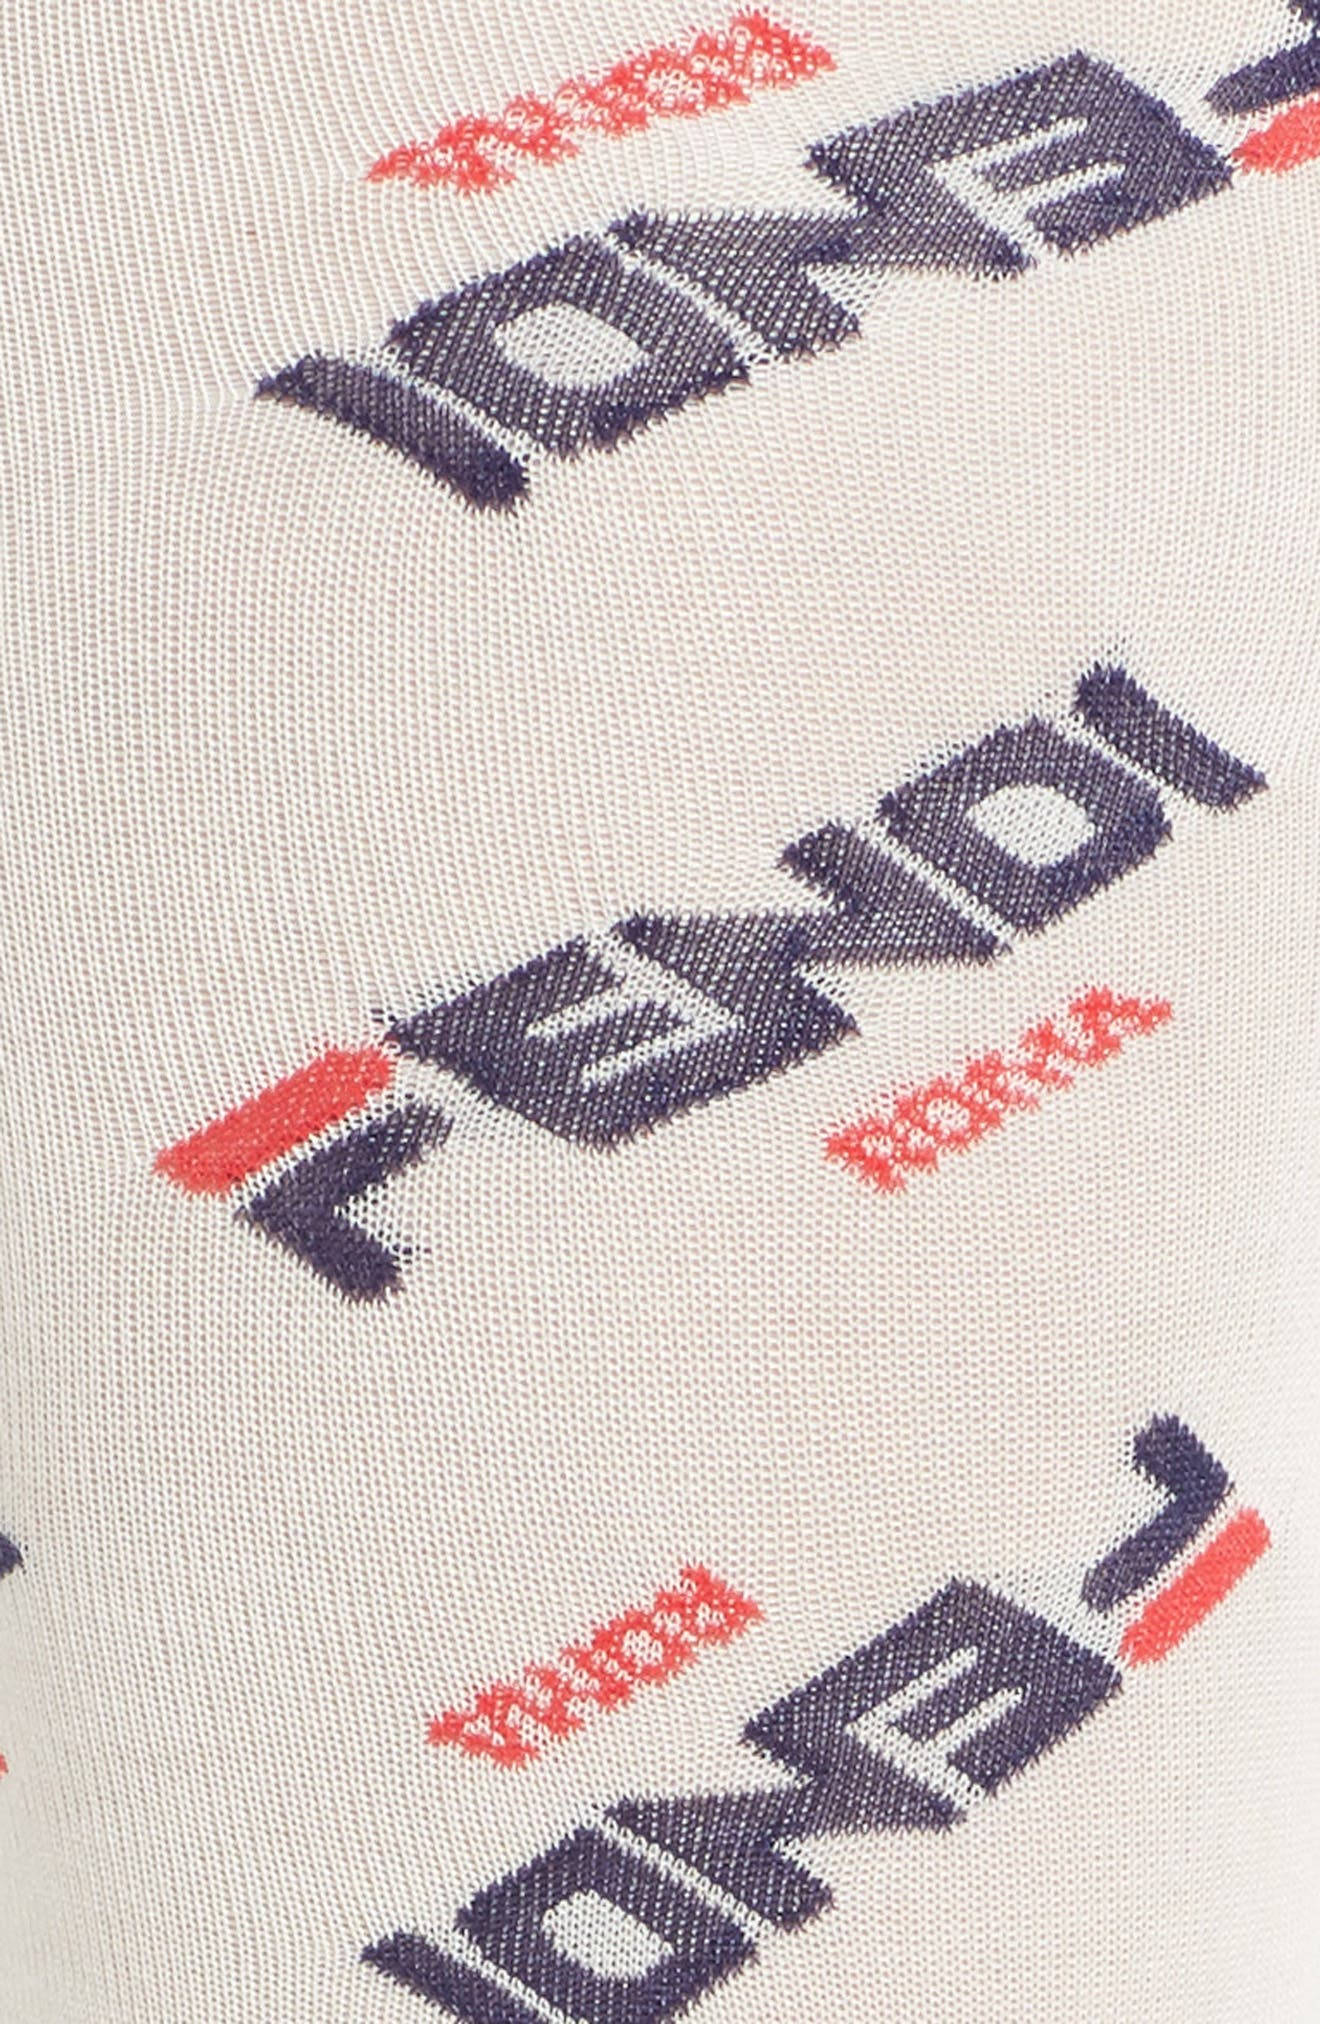 FENDI,                             x FILA Mania Logo Tights,                             Alternate thumbnail 2, color,                             WHITE MULTI